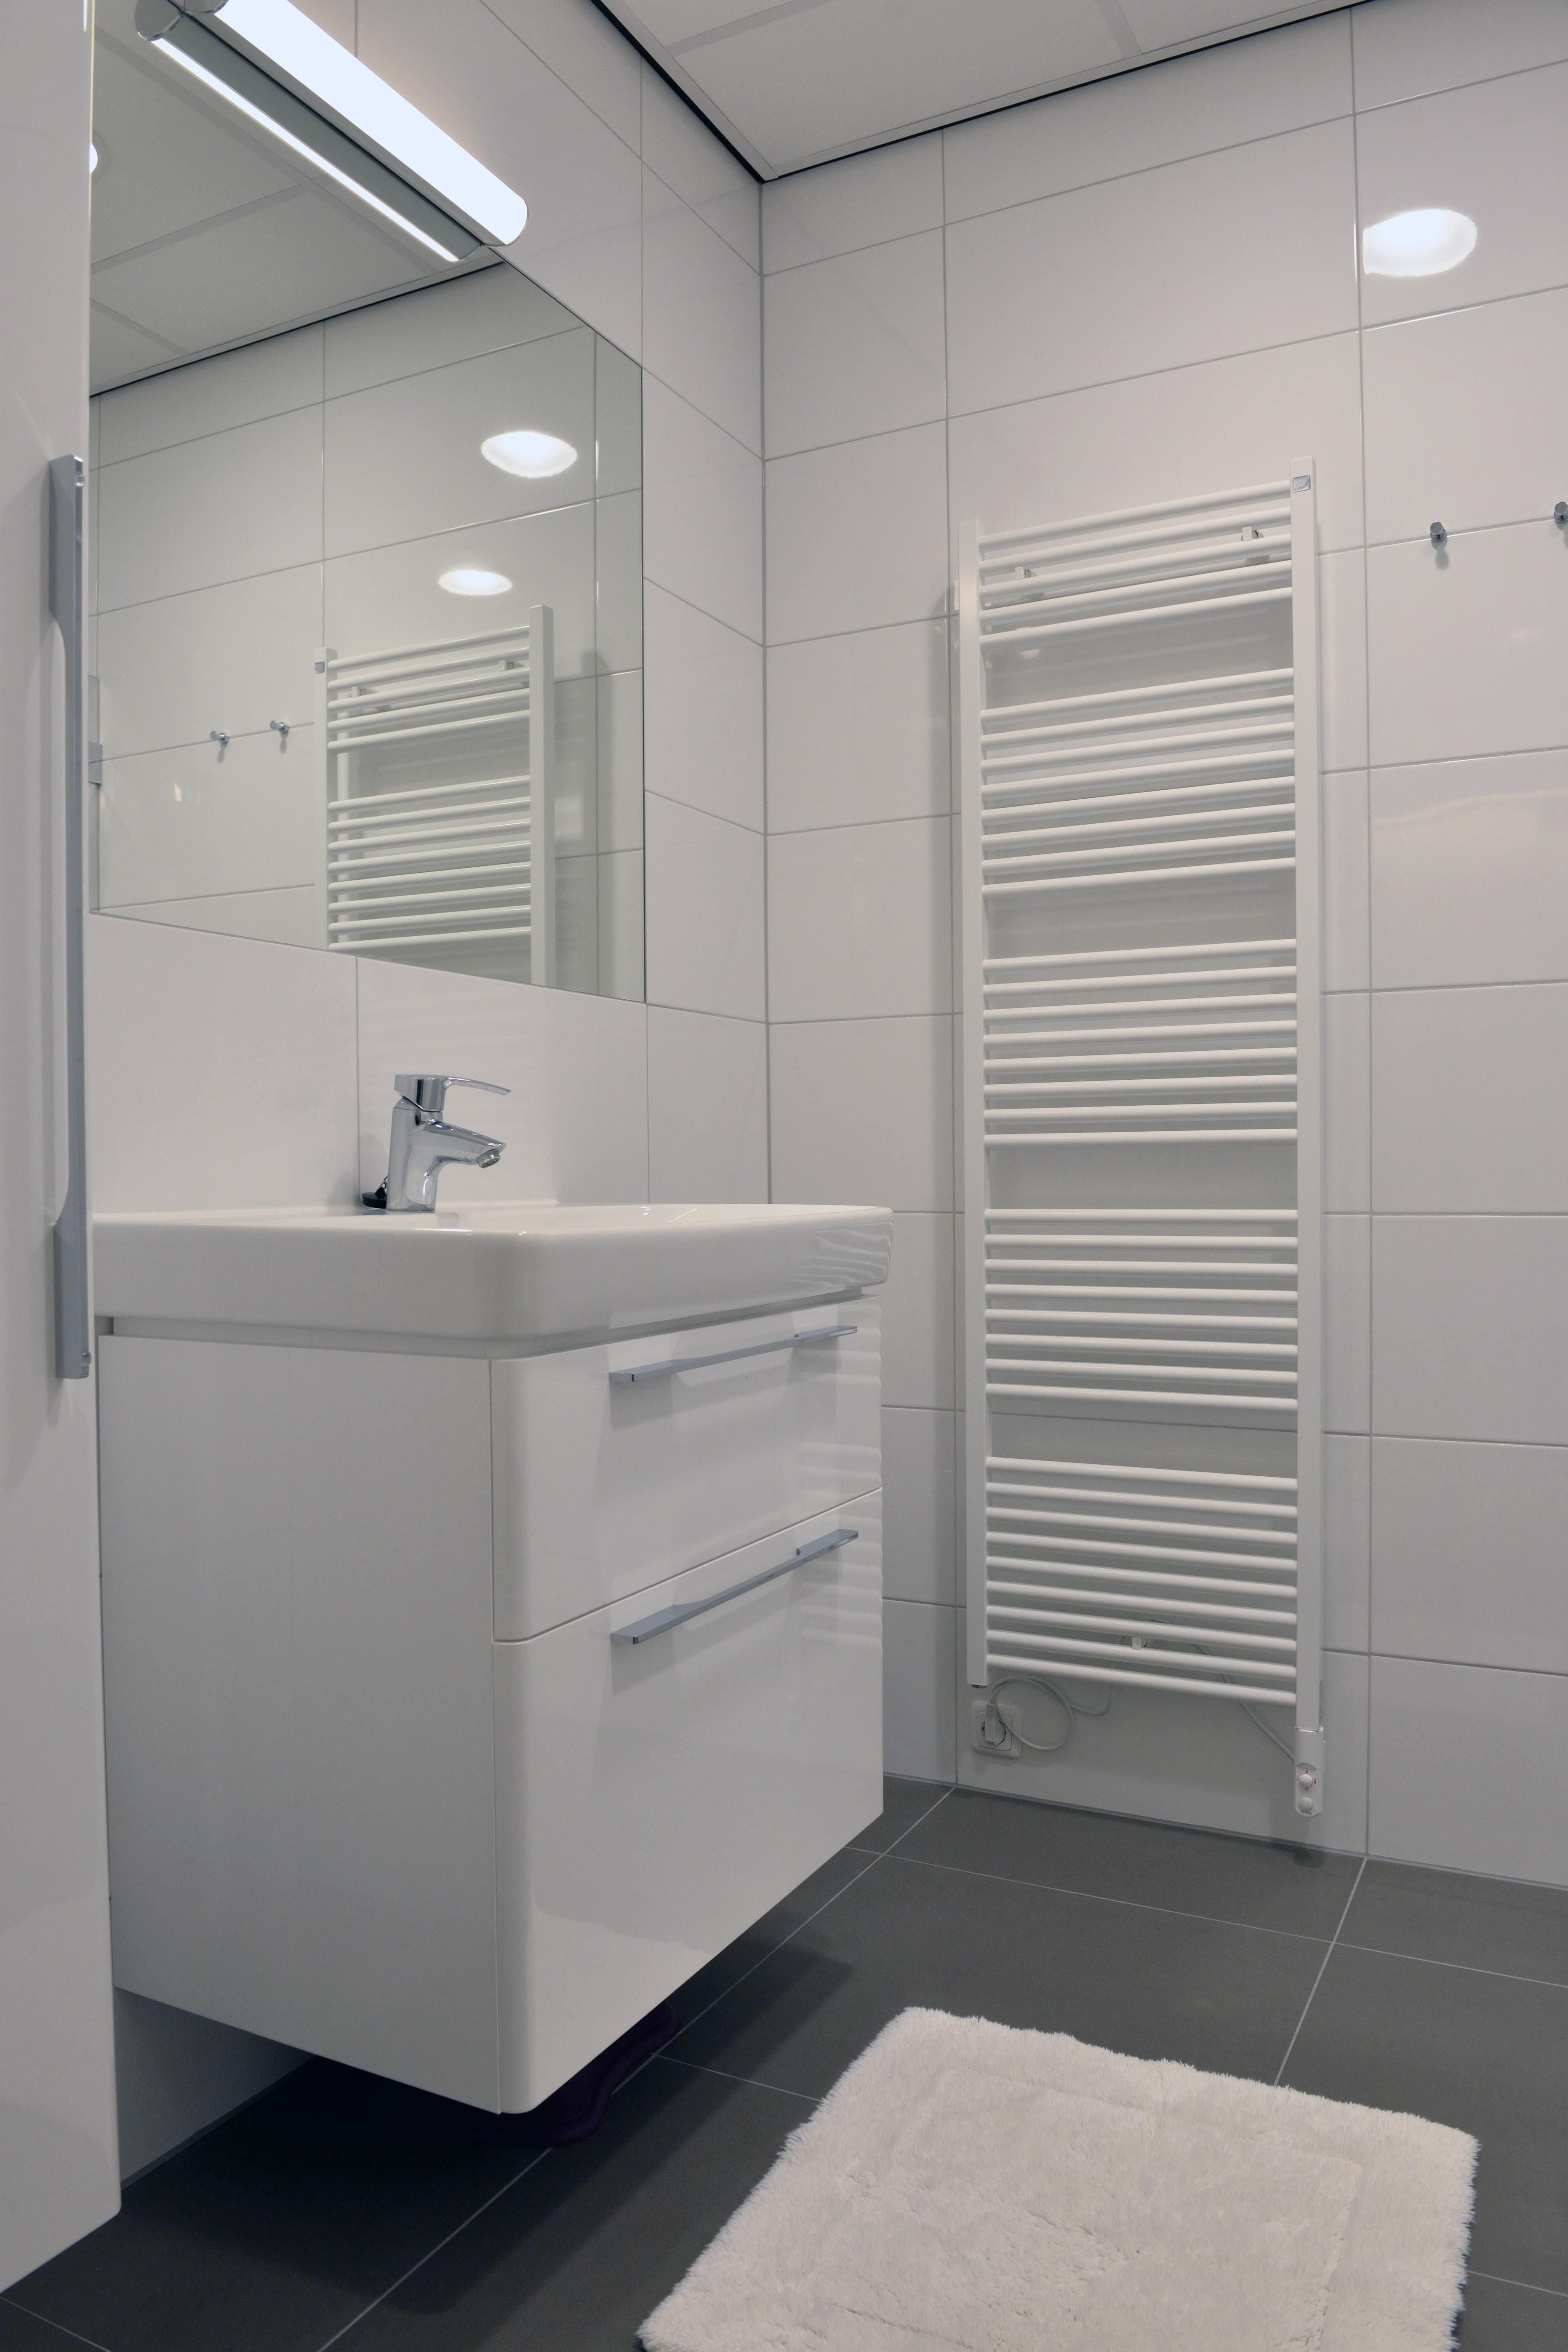 Nieuwe badkamers ronald mcdonald huis zwolle salverda - Nieuwe badkamer ...